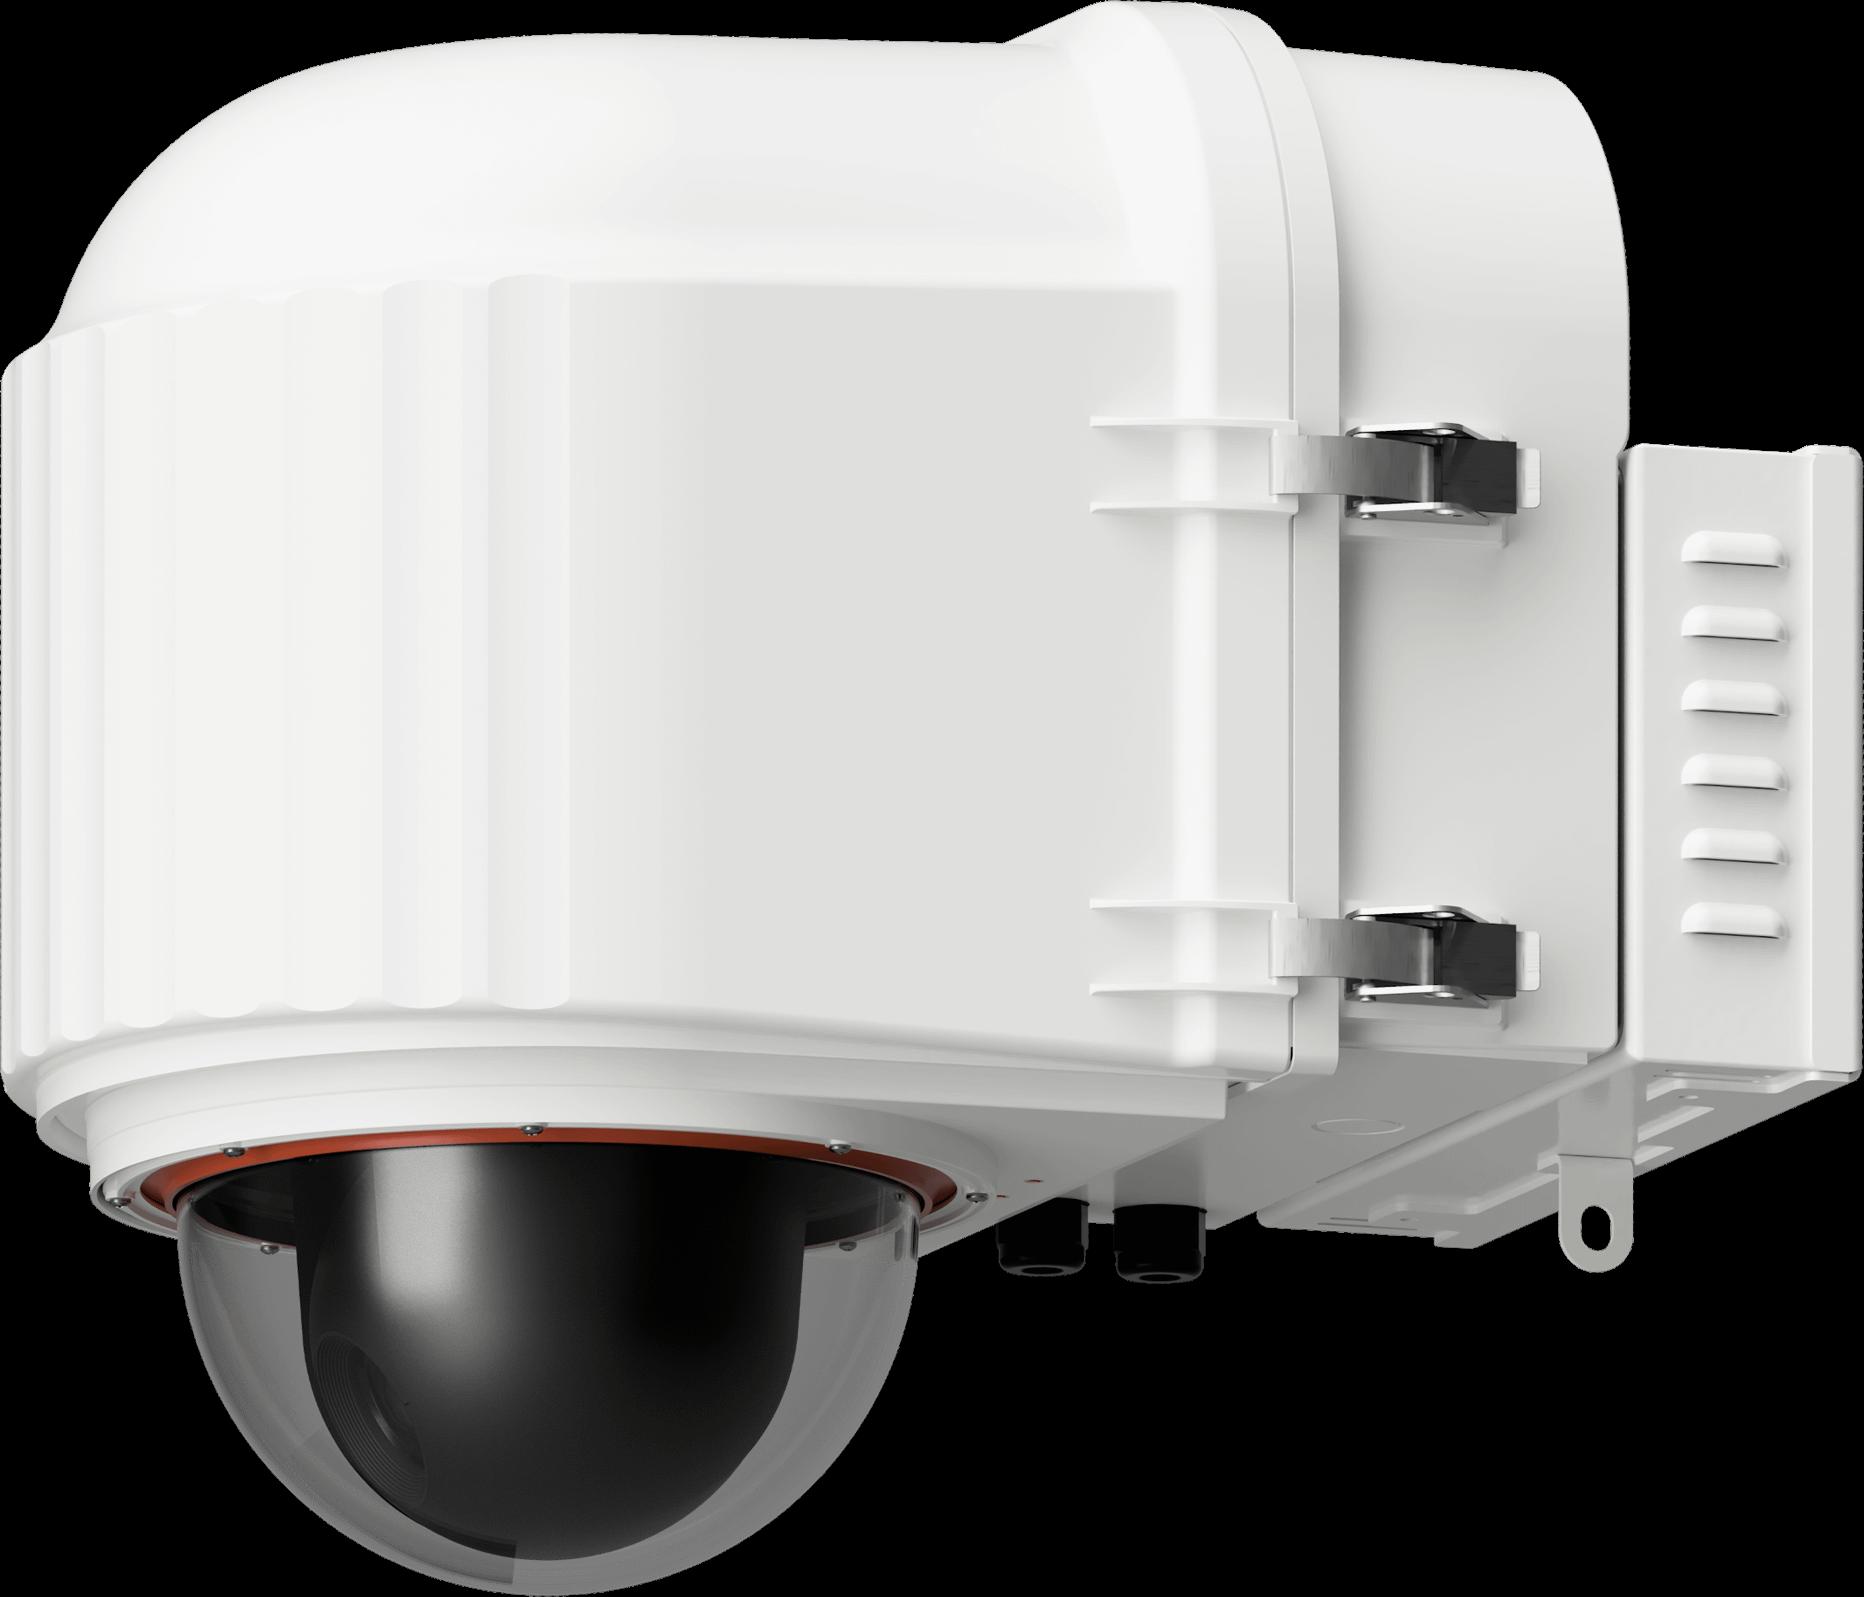 x stream designs xcold outdoor climate controlled ptz camera enclosure se